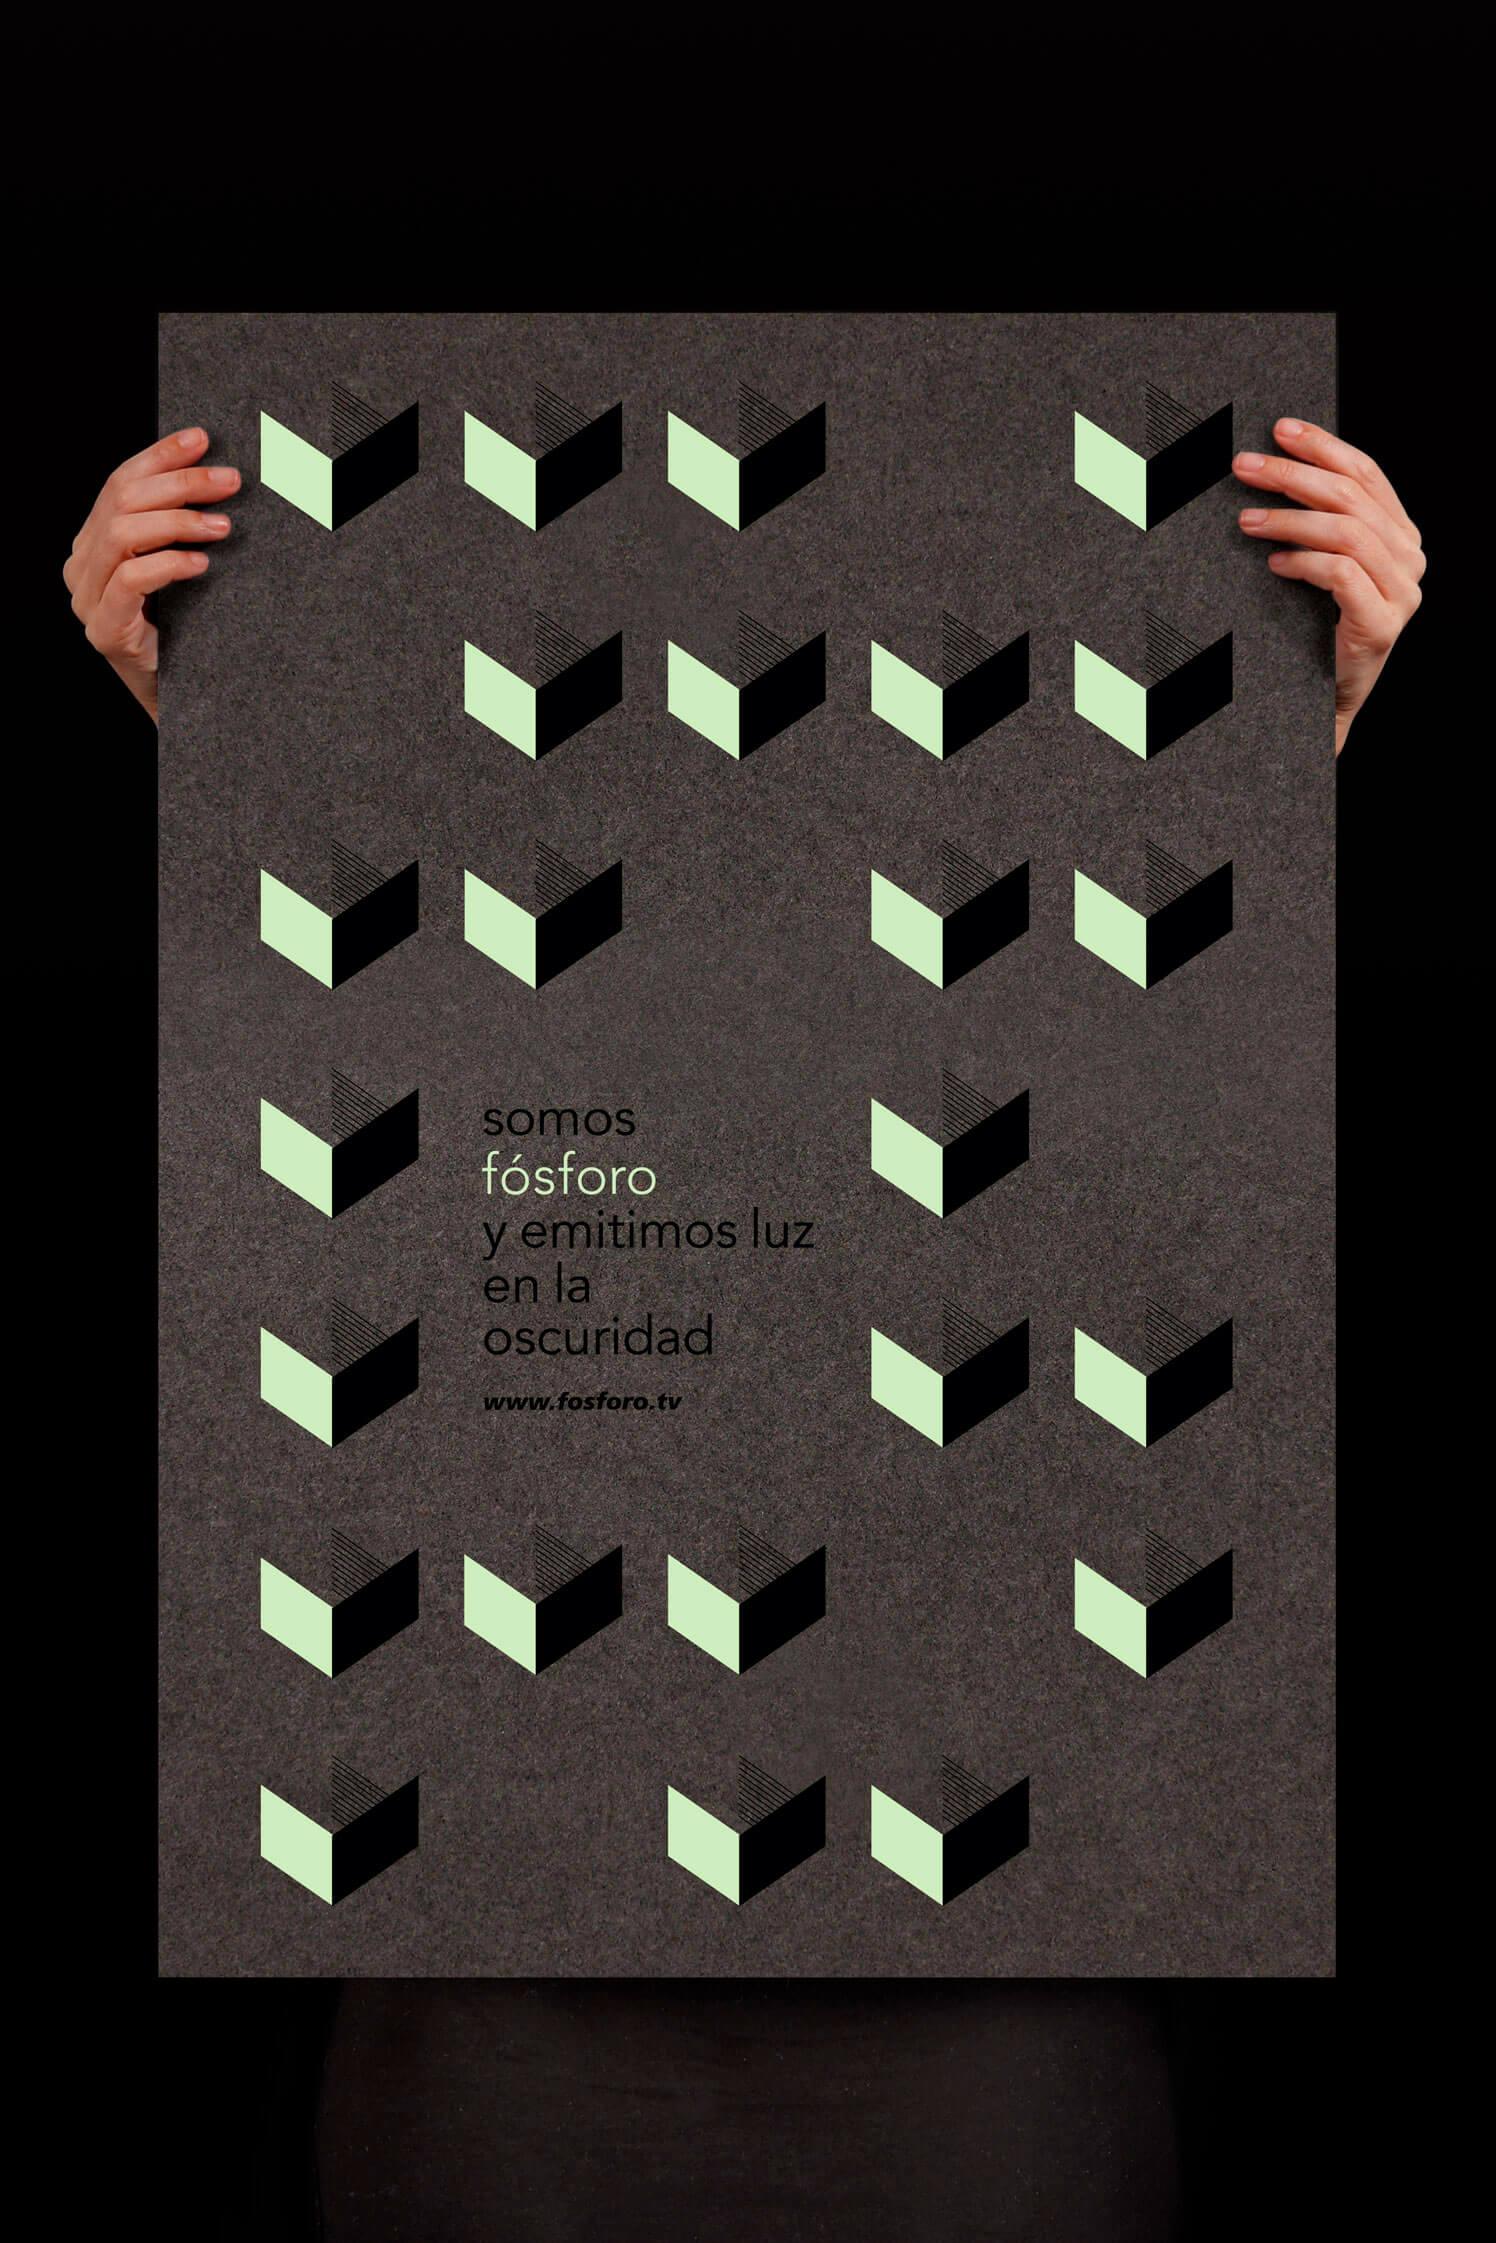 Fósforo film production branding logo design typography graphic design art direction Vibranding